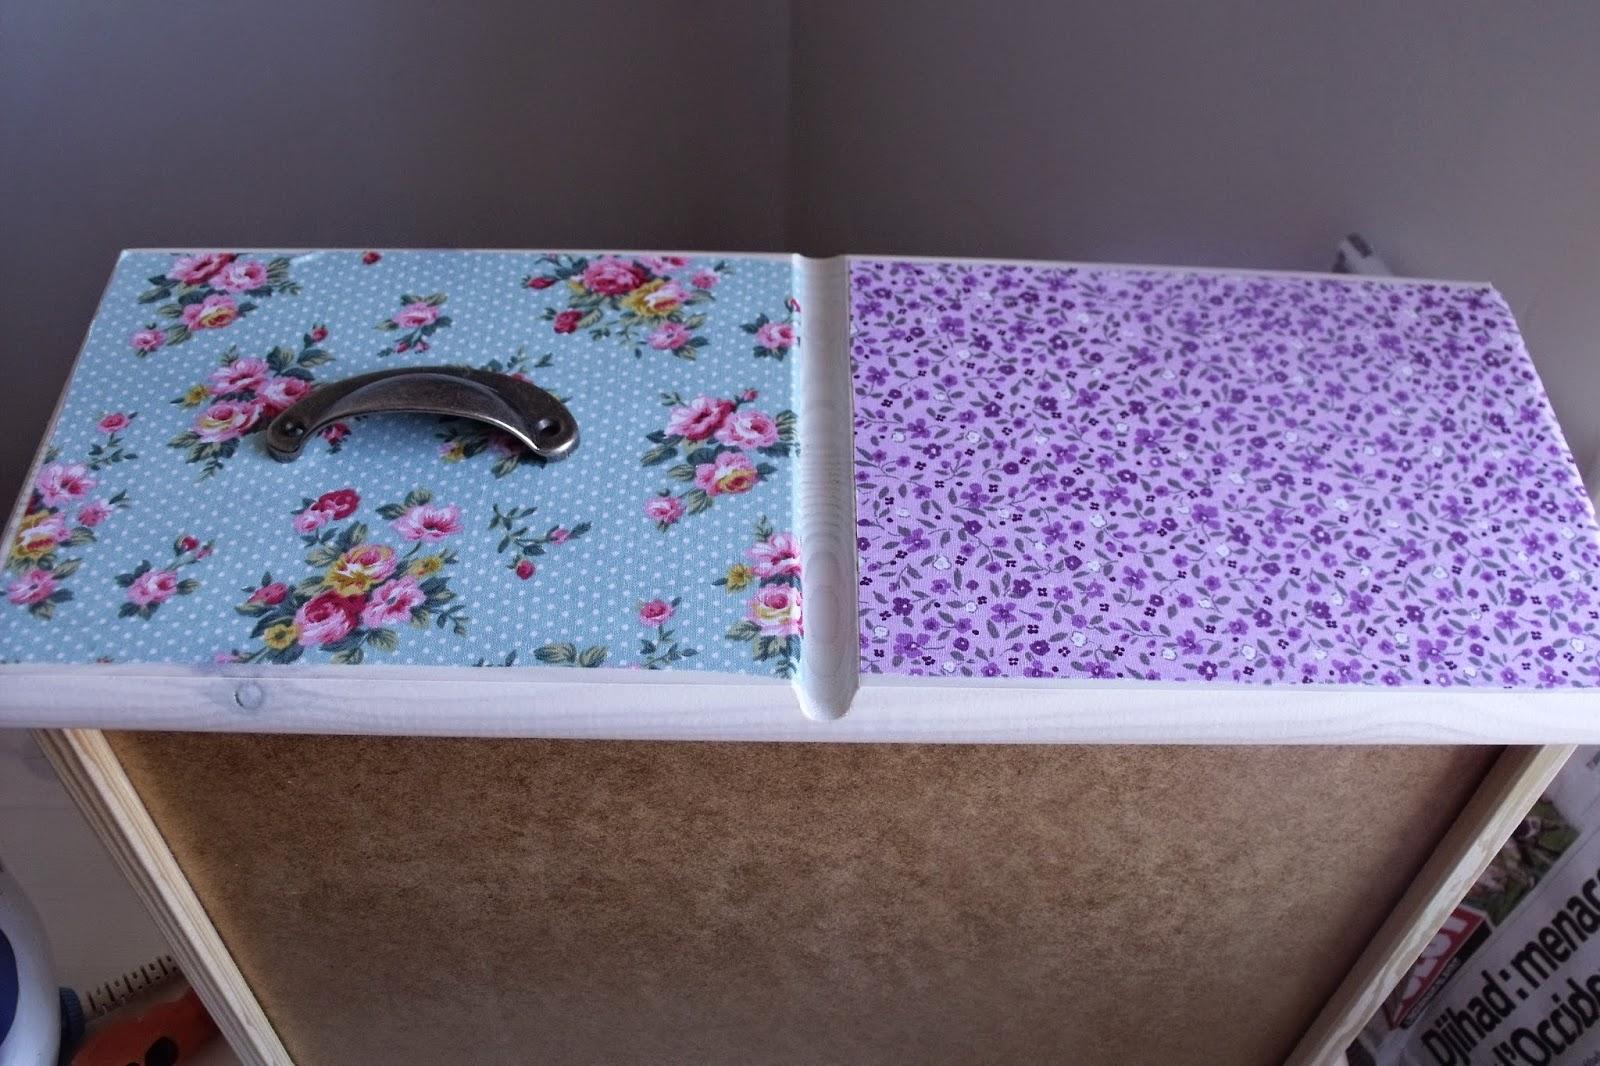 tutoriel diy customiser une commode avec du tissus. Black Bedroom Furniture Sets. Home Design Ideas